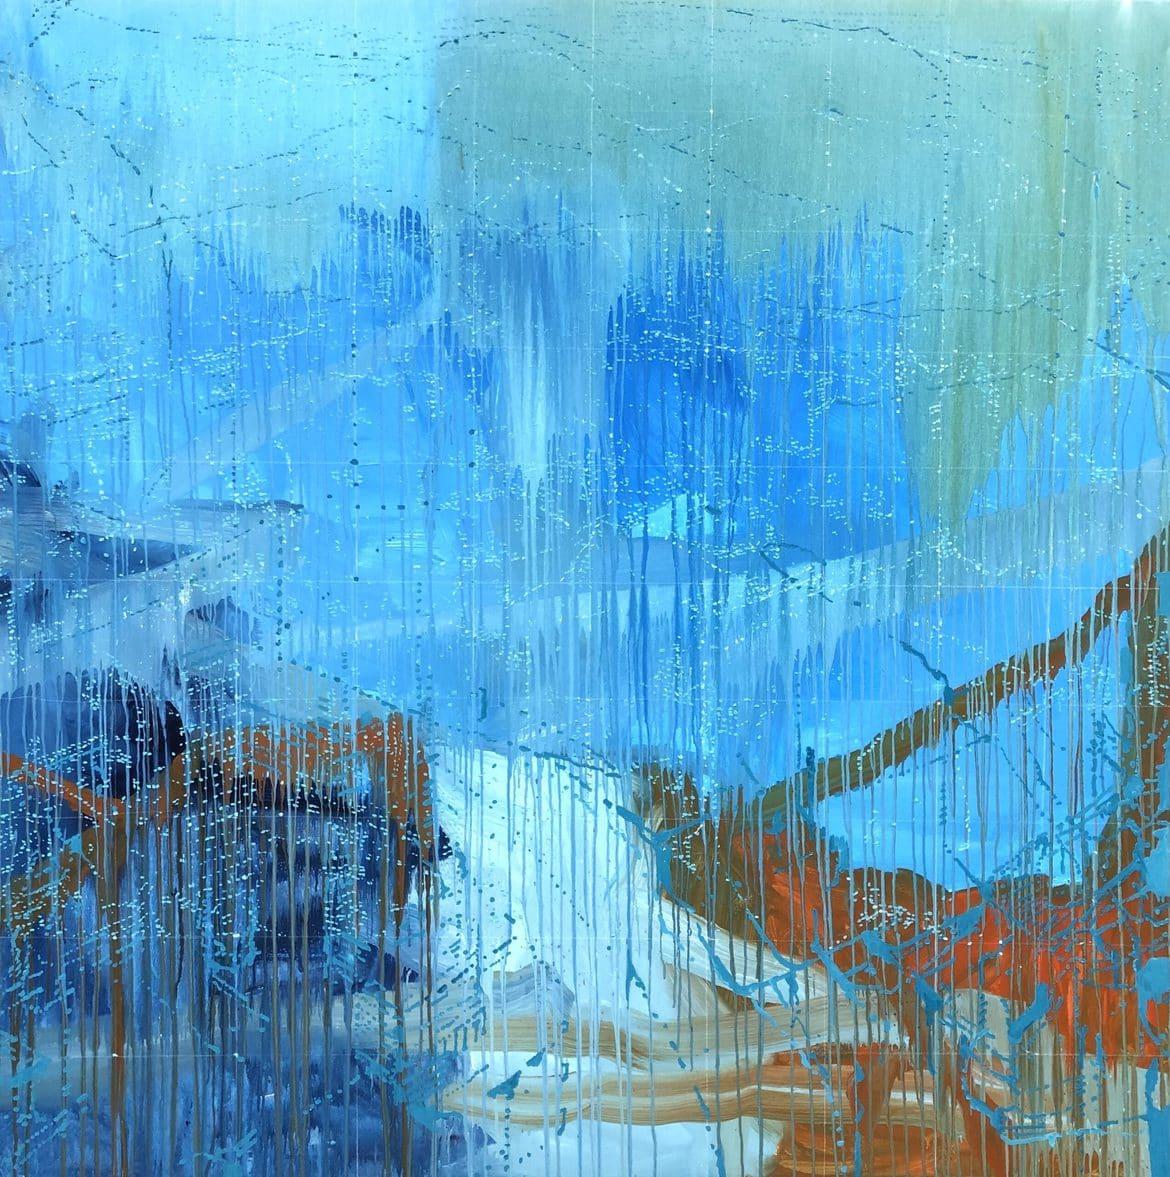 'Blue Rise (Hokusai Rain)', 2021, acrylic and oil on linen, 189 x 191 cm